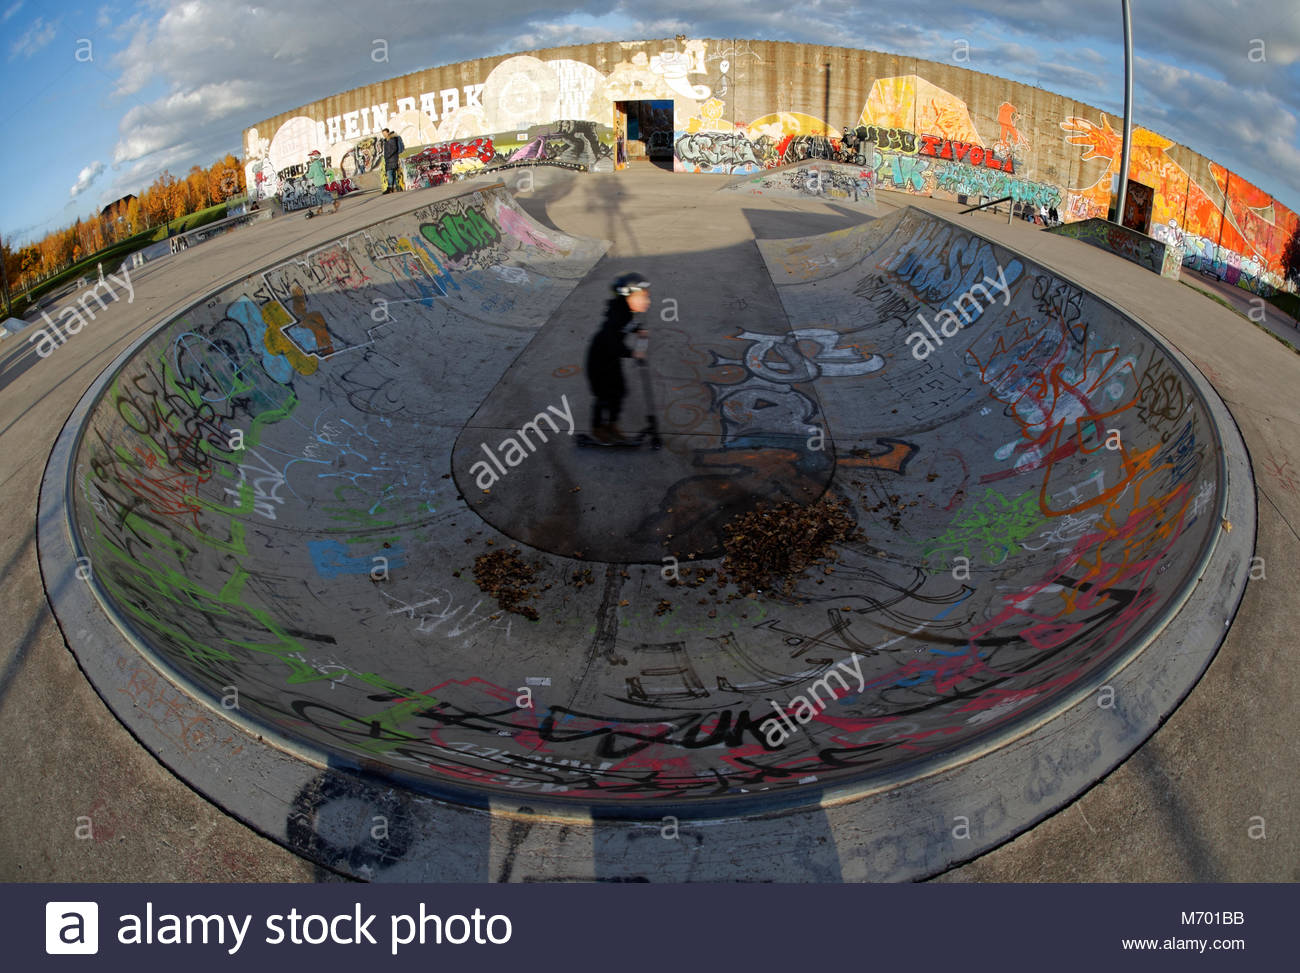 Graffiti Duisburg skatepark sport scateboarder half pipe recreation colourful